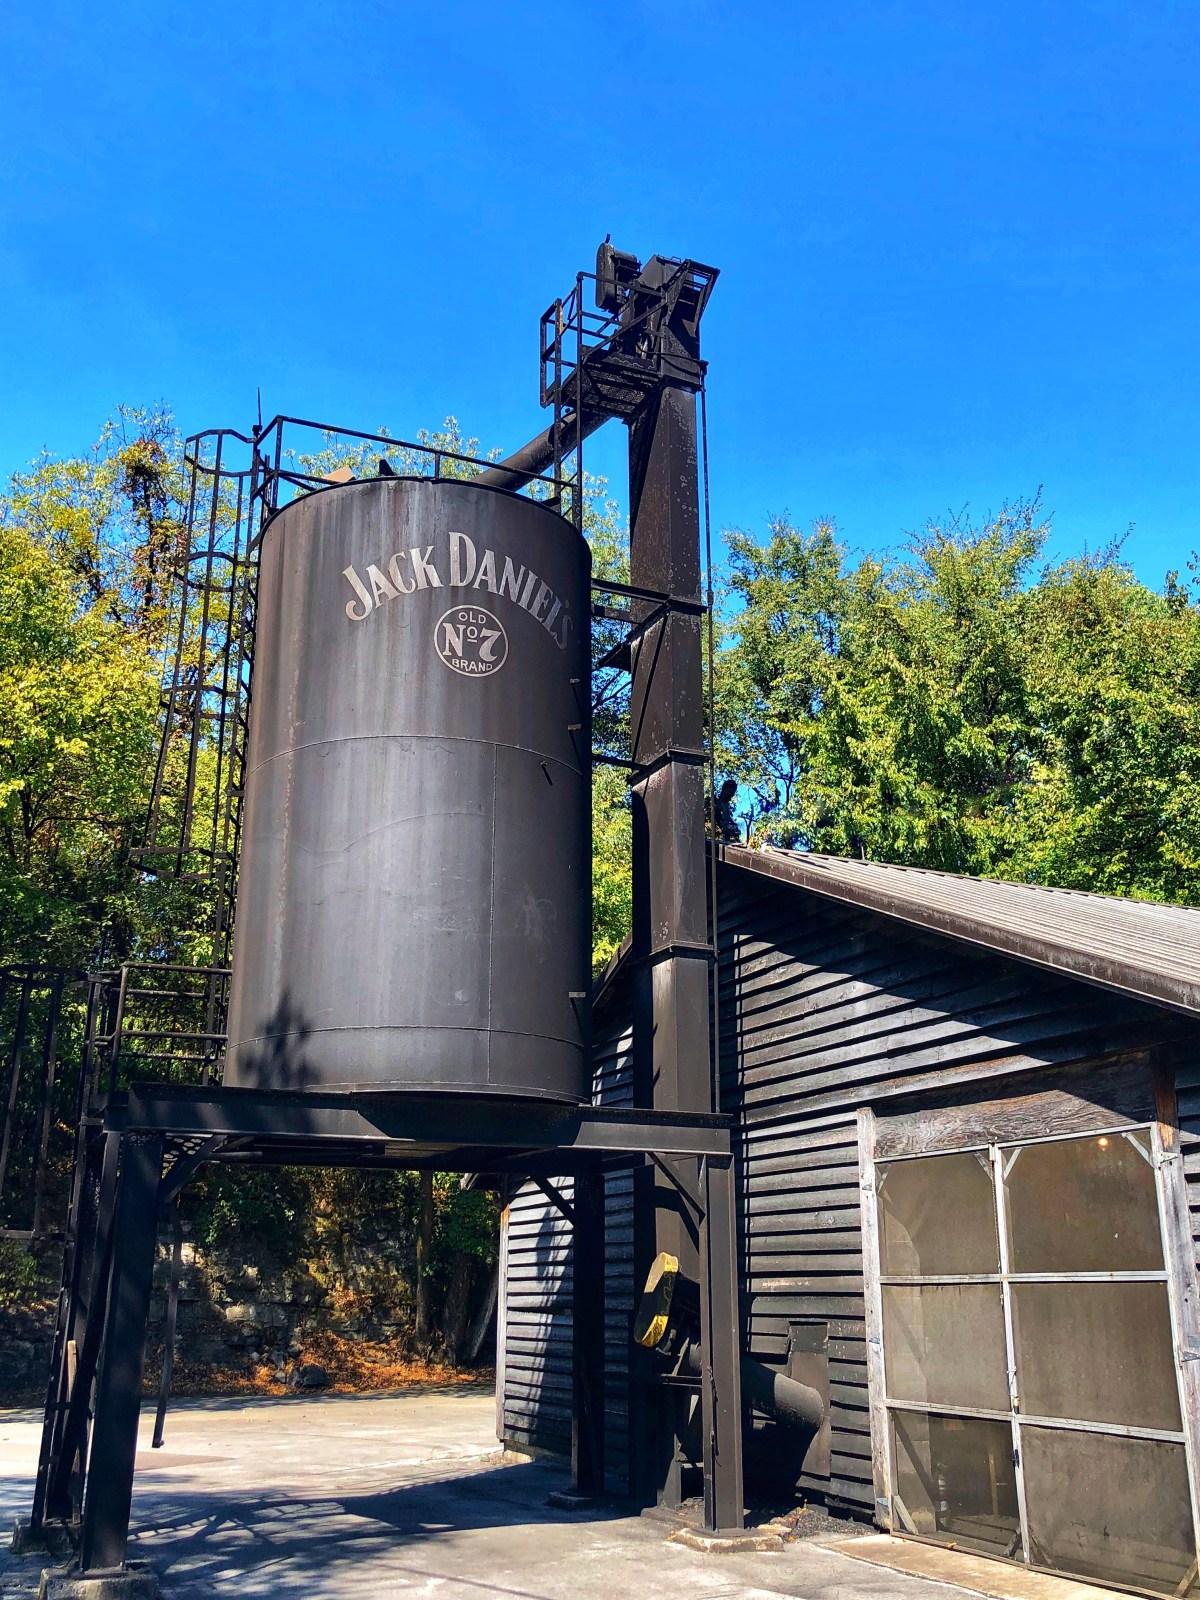 Jack Daniels Distillery Tour #jackdanielsdistillery #jacksdaniels #lynchburgtn #lynchburg #nasvilletn #nashvilletours